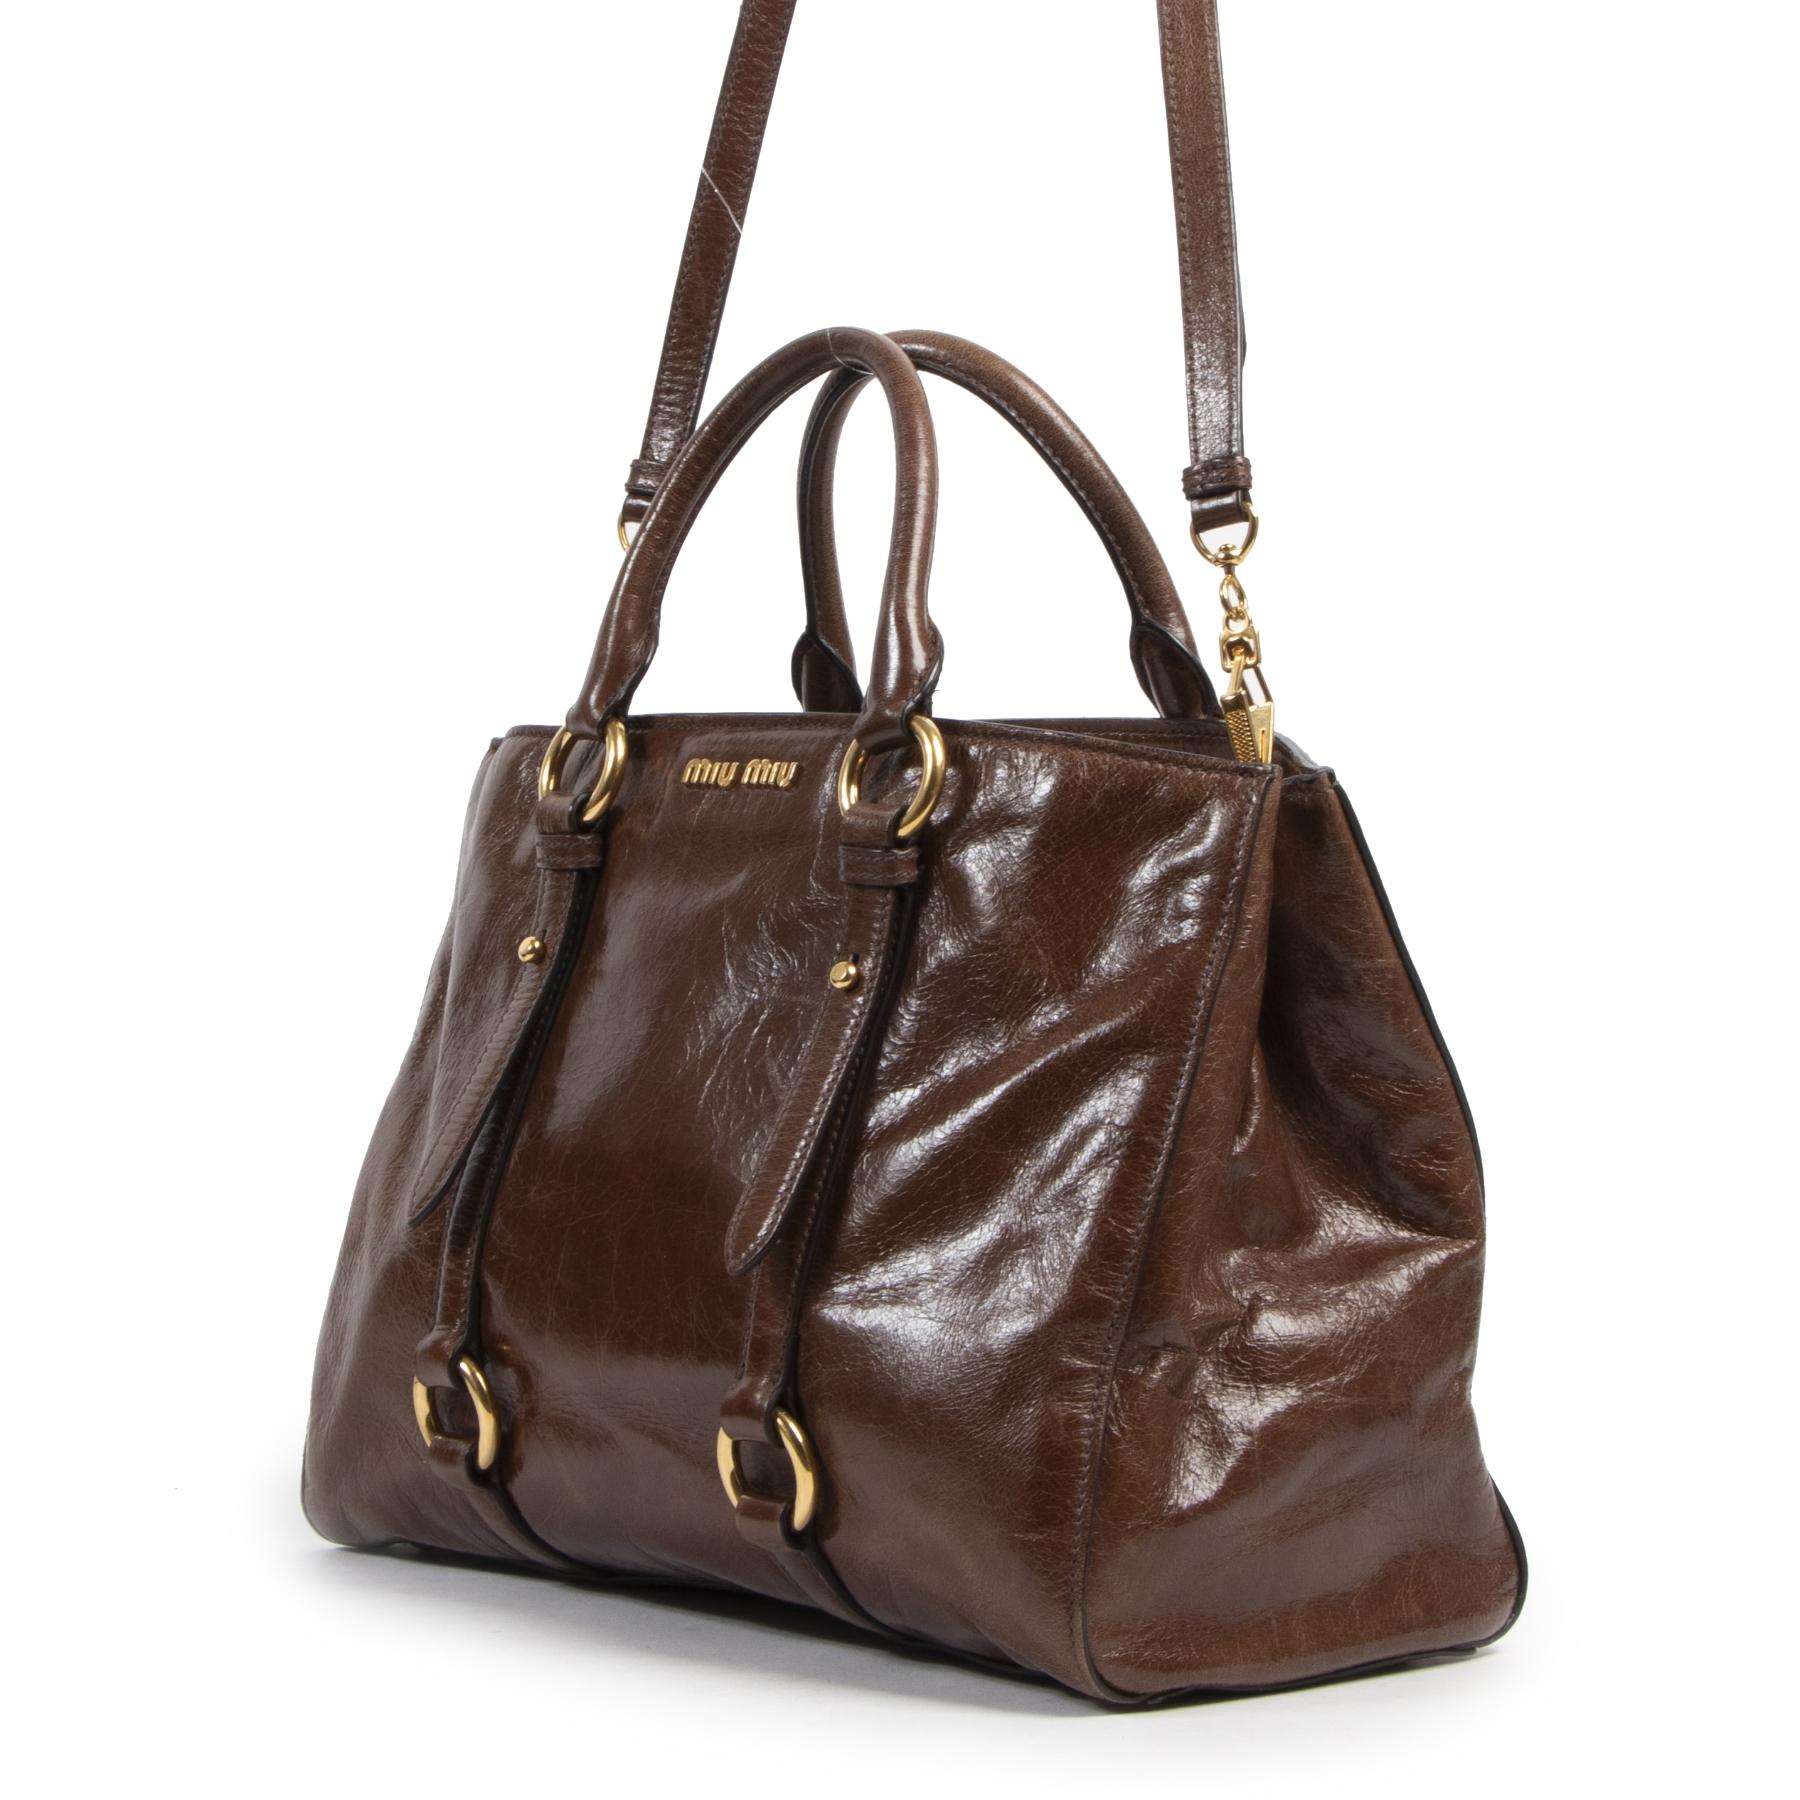 Authentic secondhand Miu Miu Vitello Shine Brown Leather Satchel designer bags fashion luxury vintage webshop safe secure online shopping designer high end brands leather bags